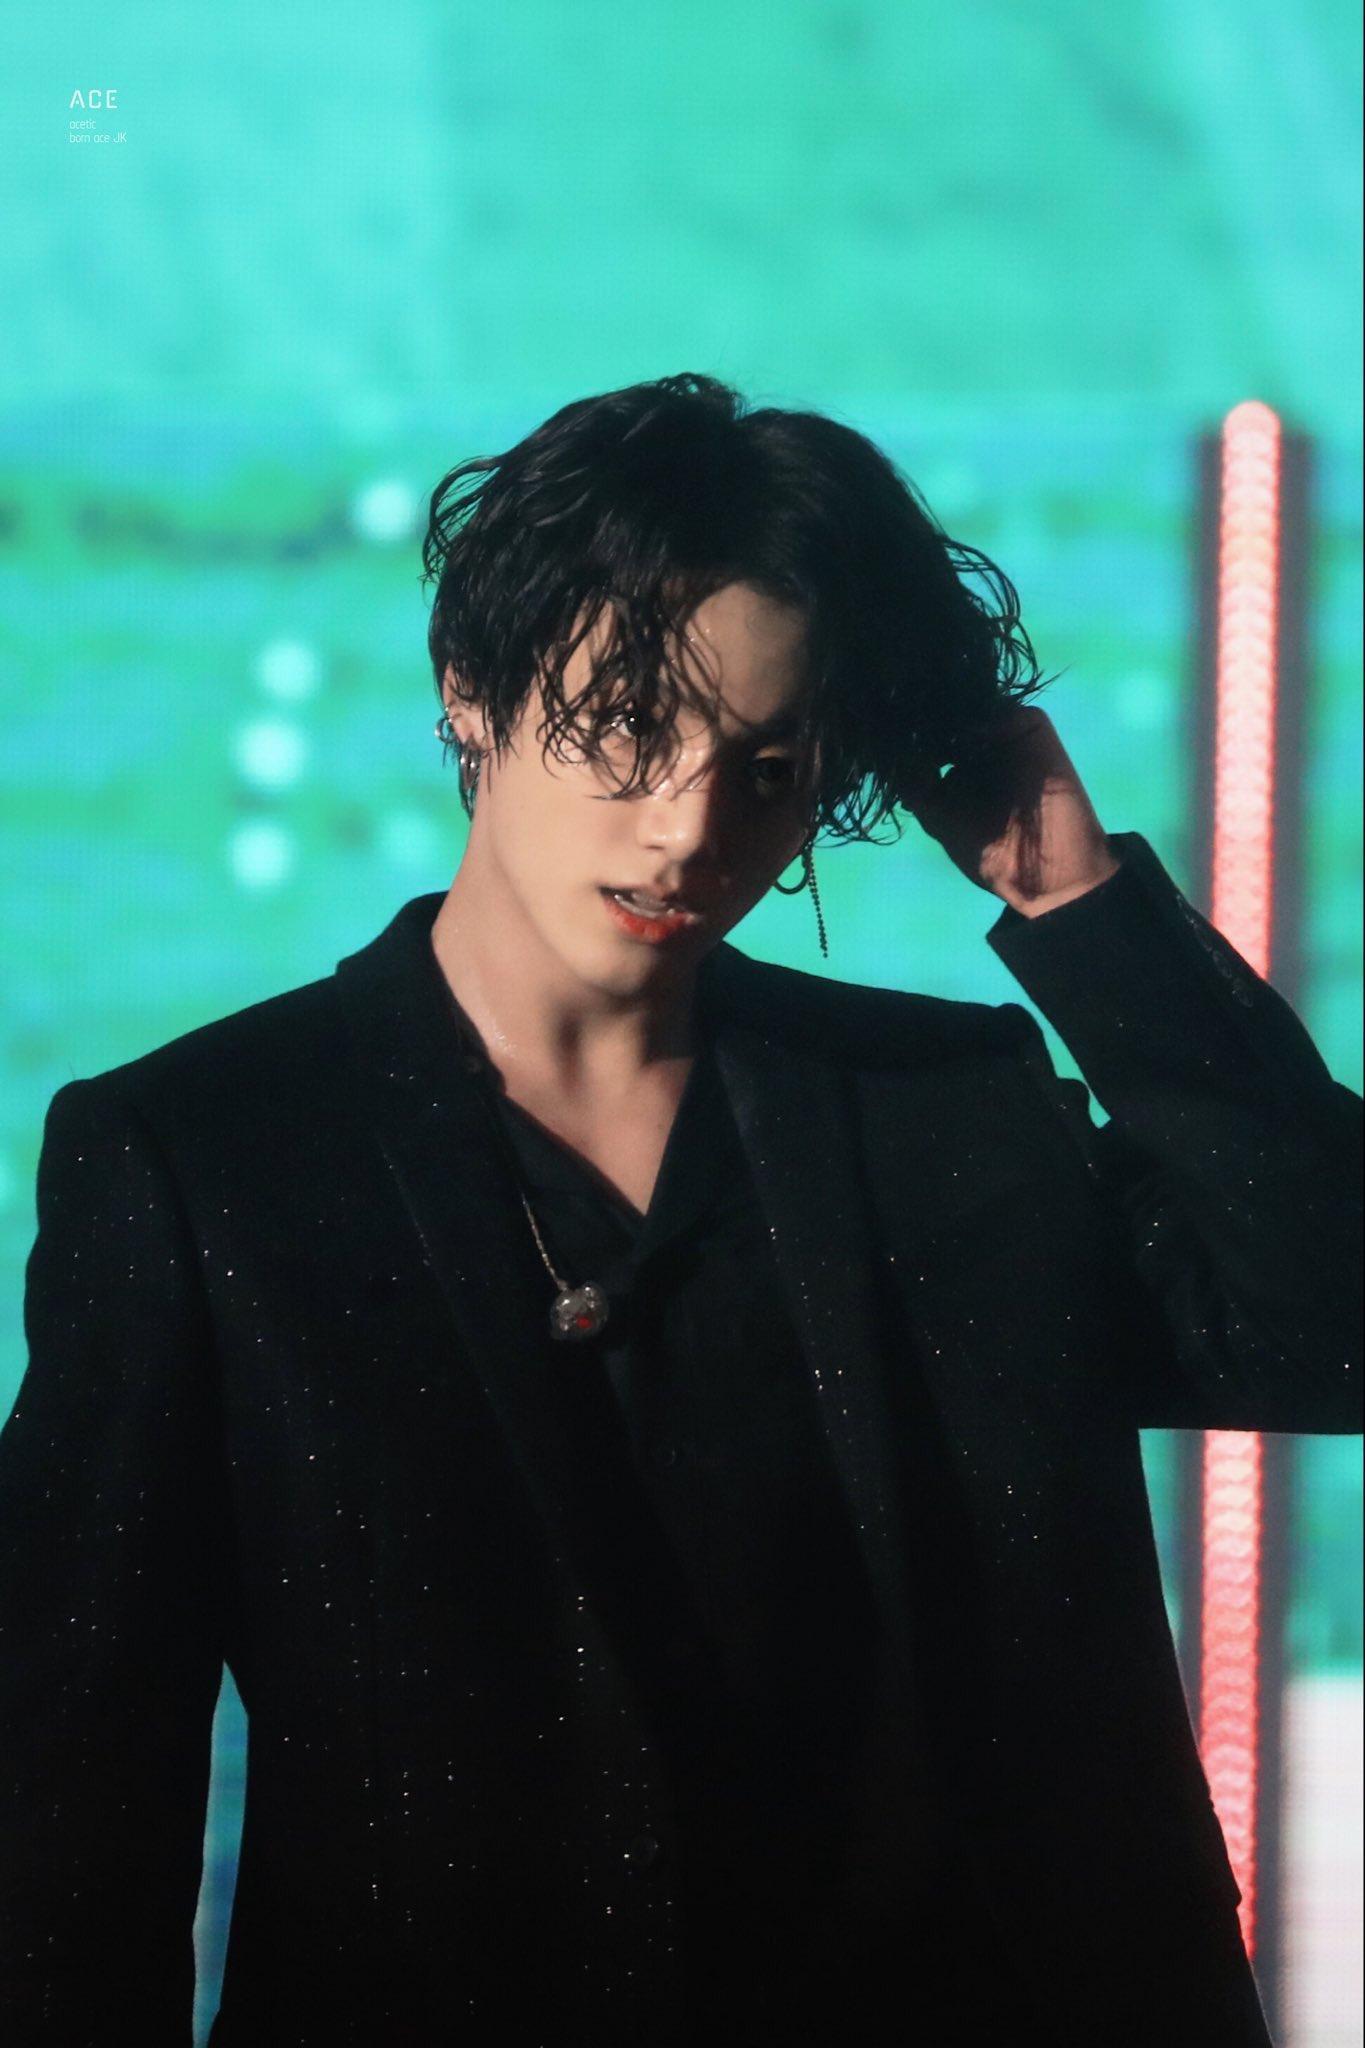 jungkook long hair1